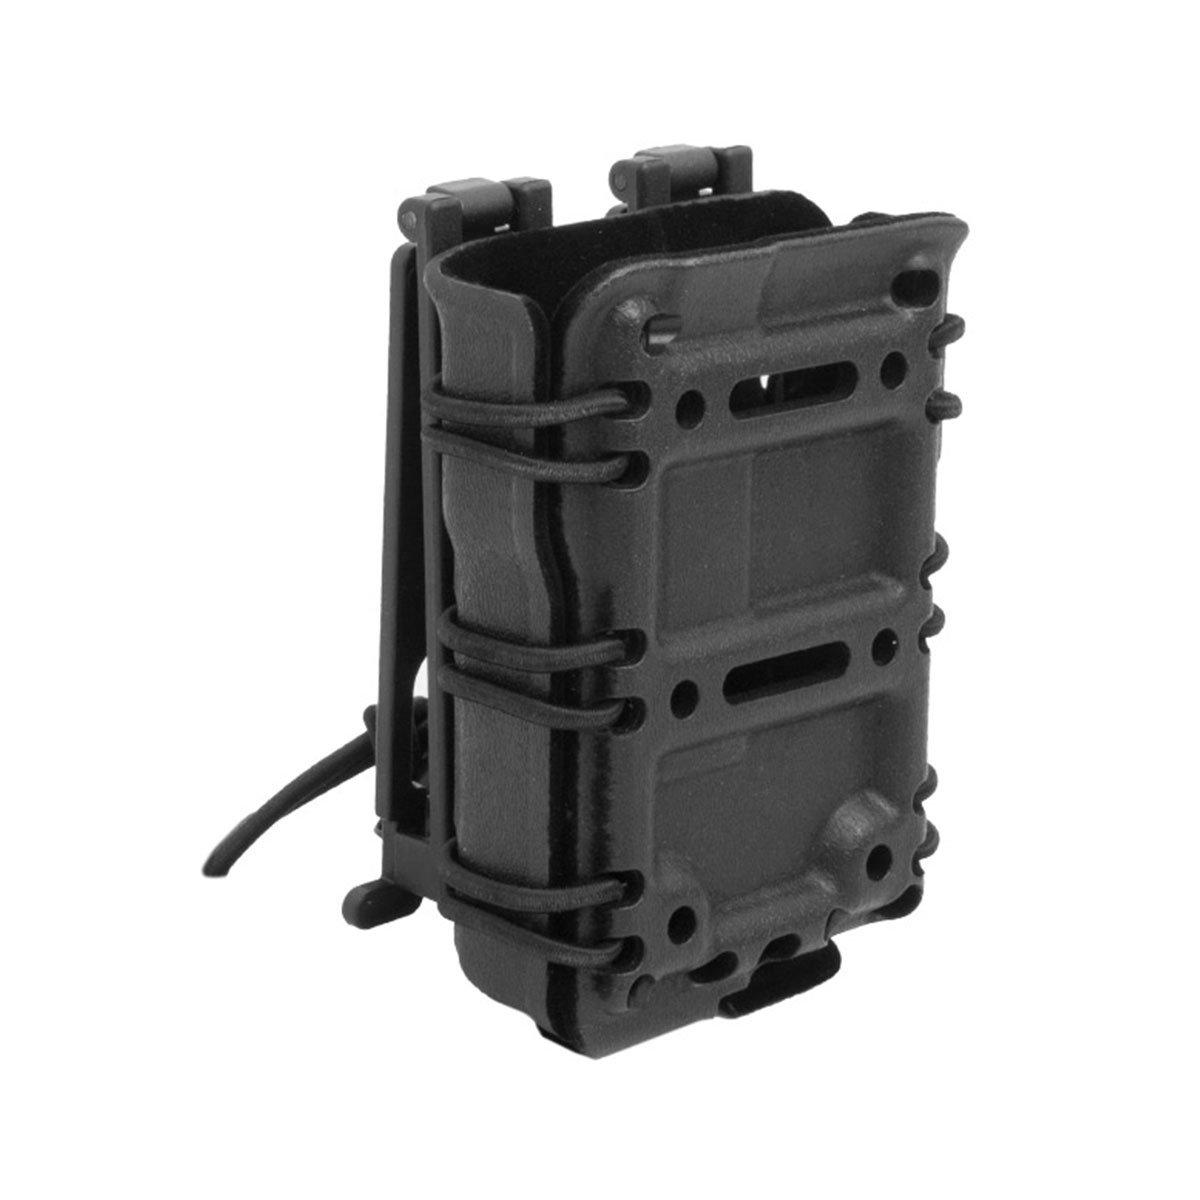 Porta Carregador FMA Scorpion para Molle Rifle Mag 7.62 Preto